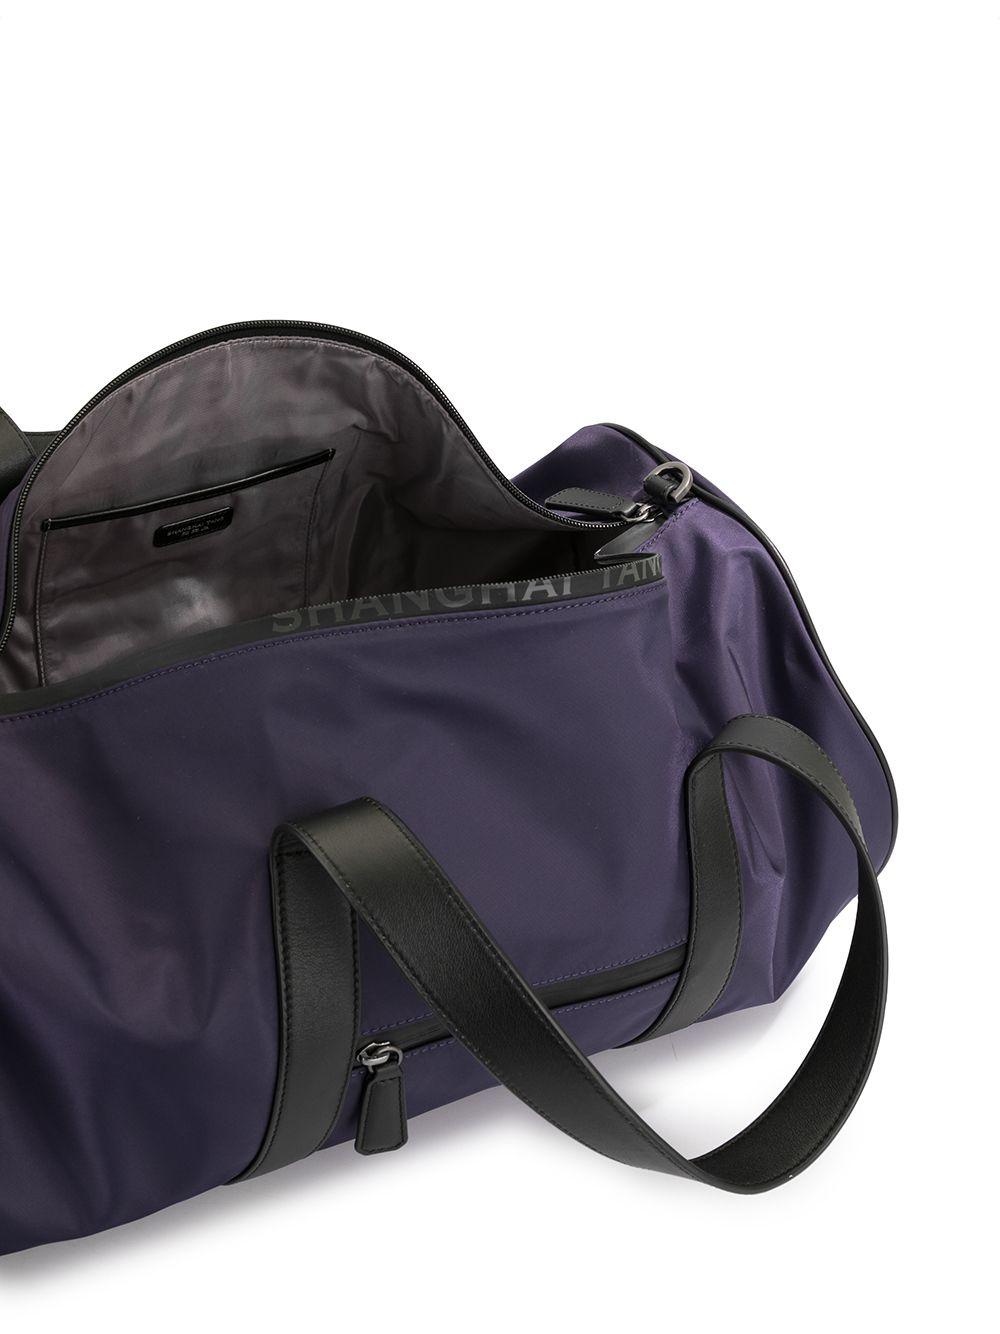 Shanghai Tang | Shanghai Tang спортивная сумка с вышивкой | Clouty